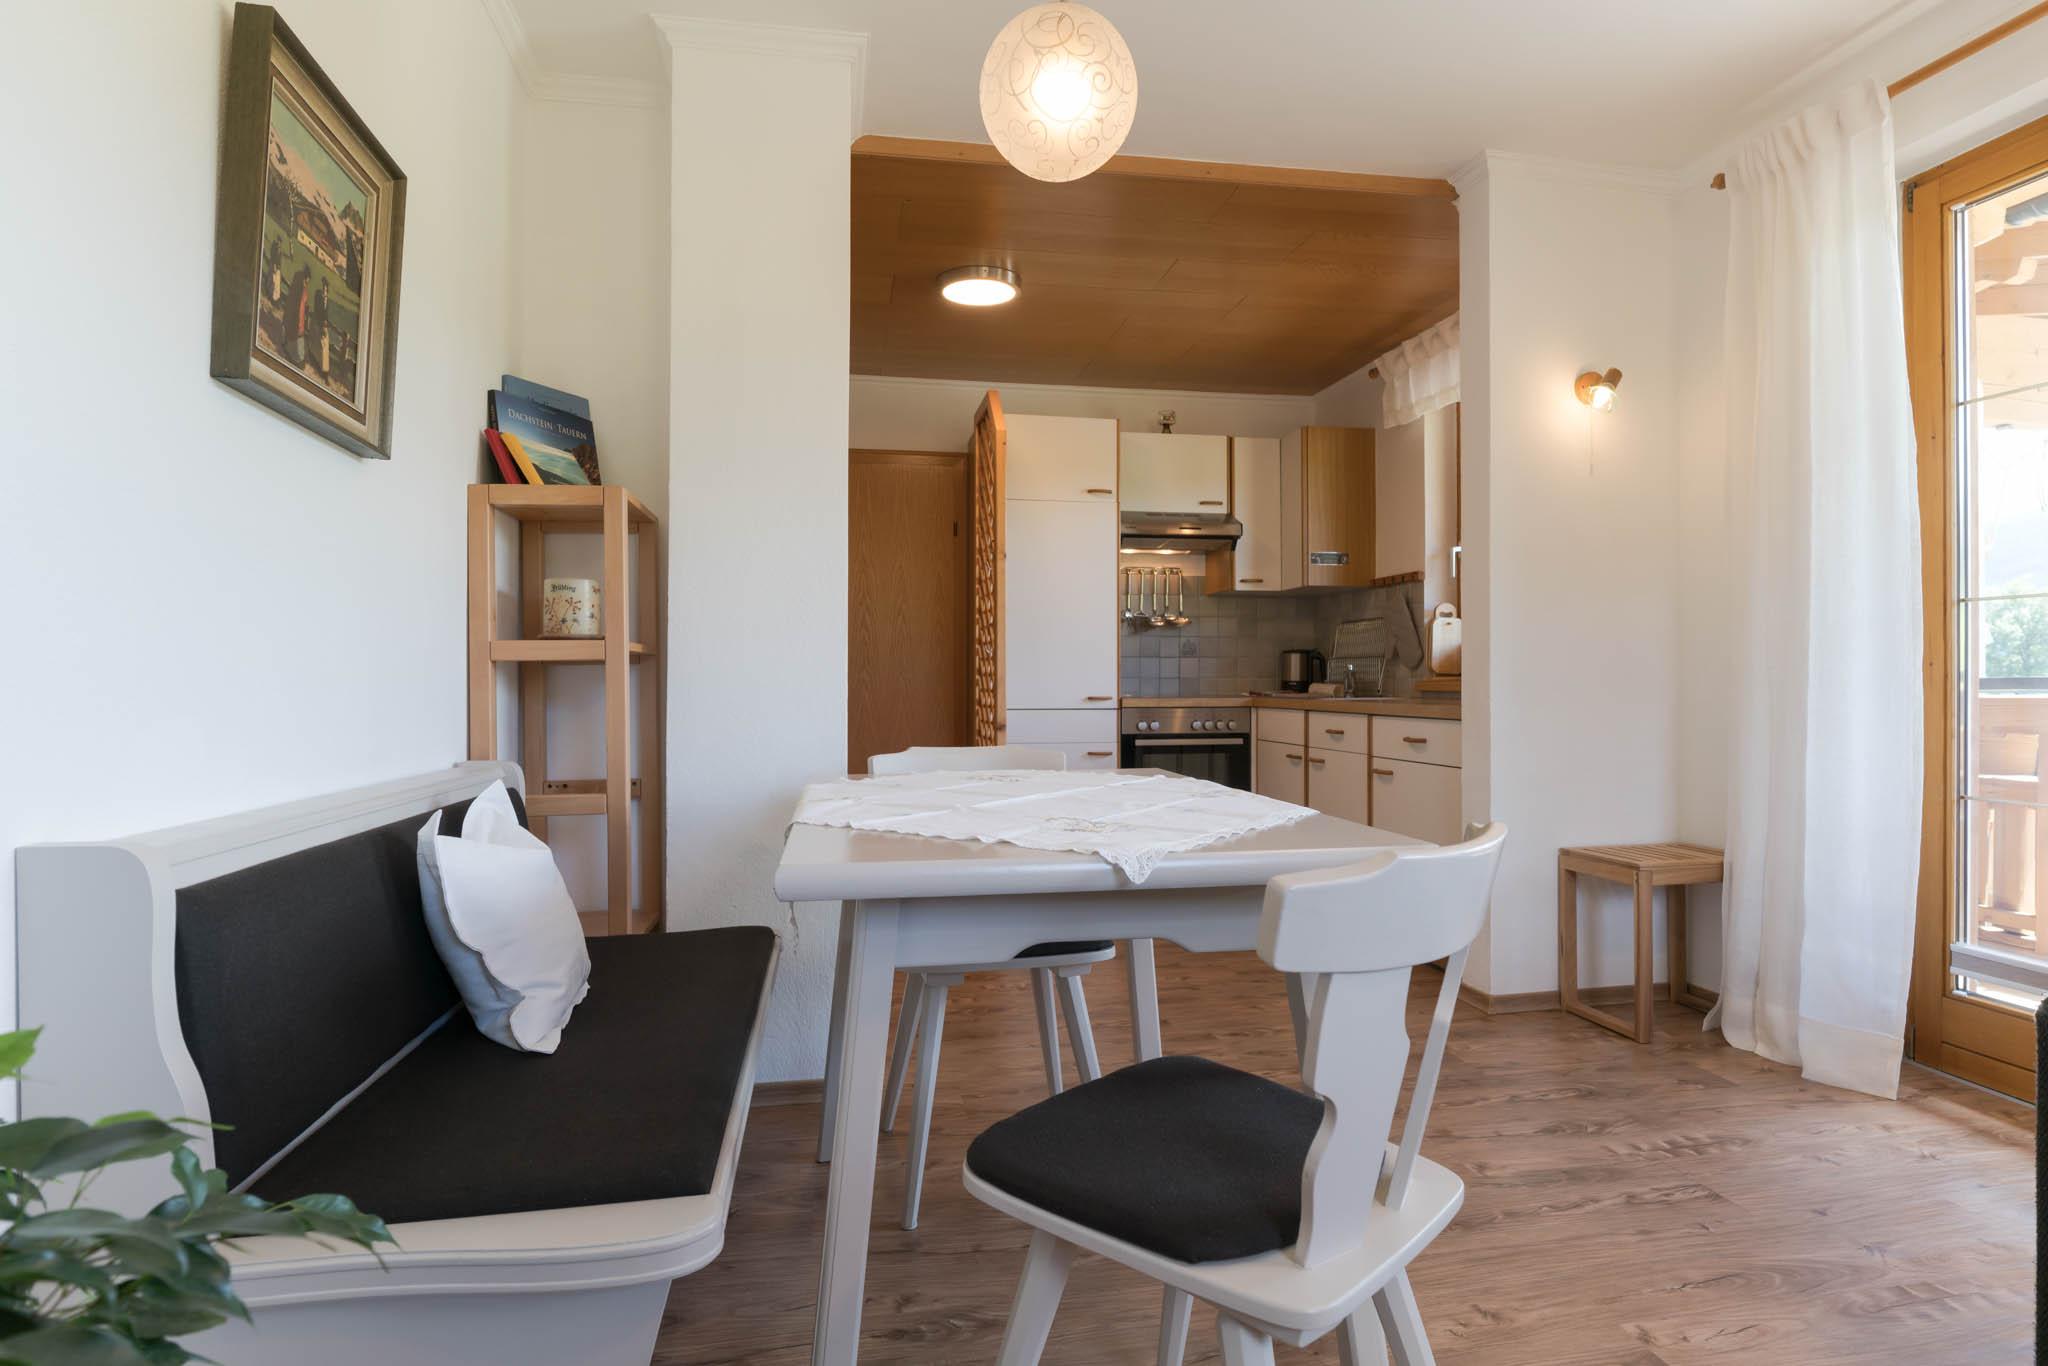 laerchmoos_appartement-B-4 (2)